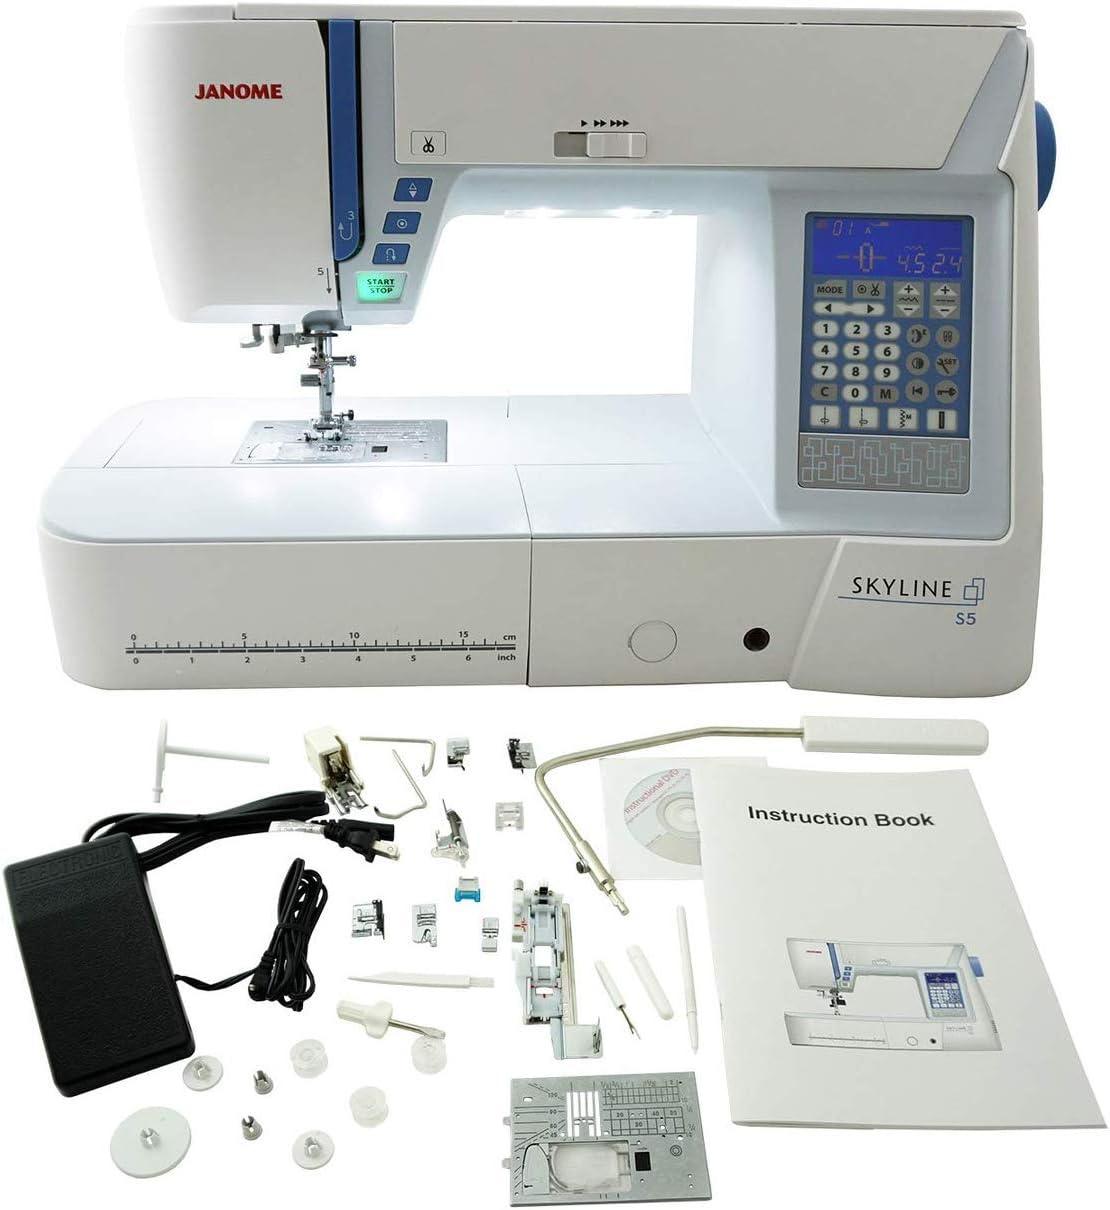 Janome Low price S5 Oklahoma City Mall Computerized Machine Sewing